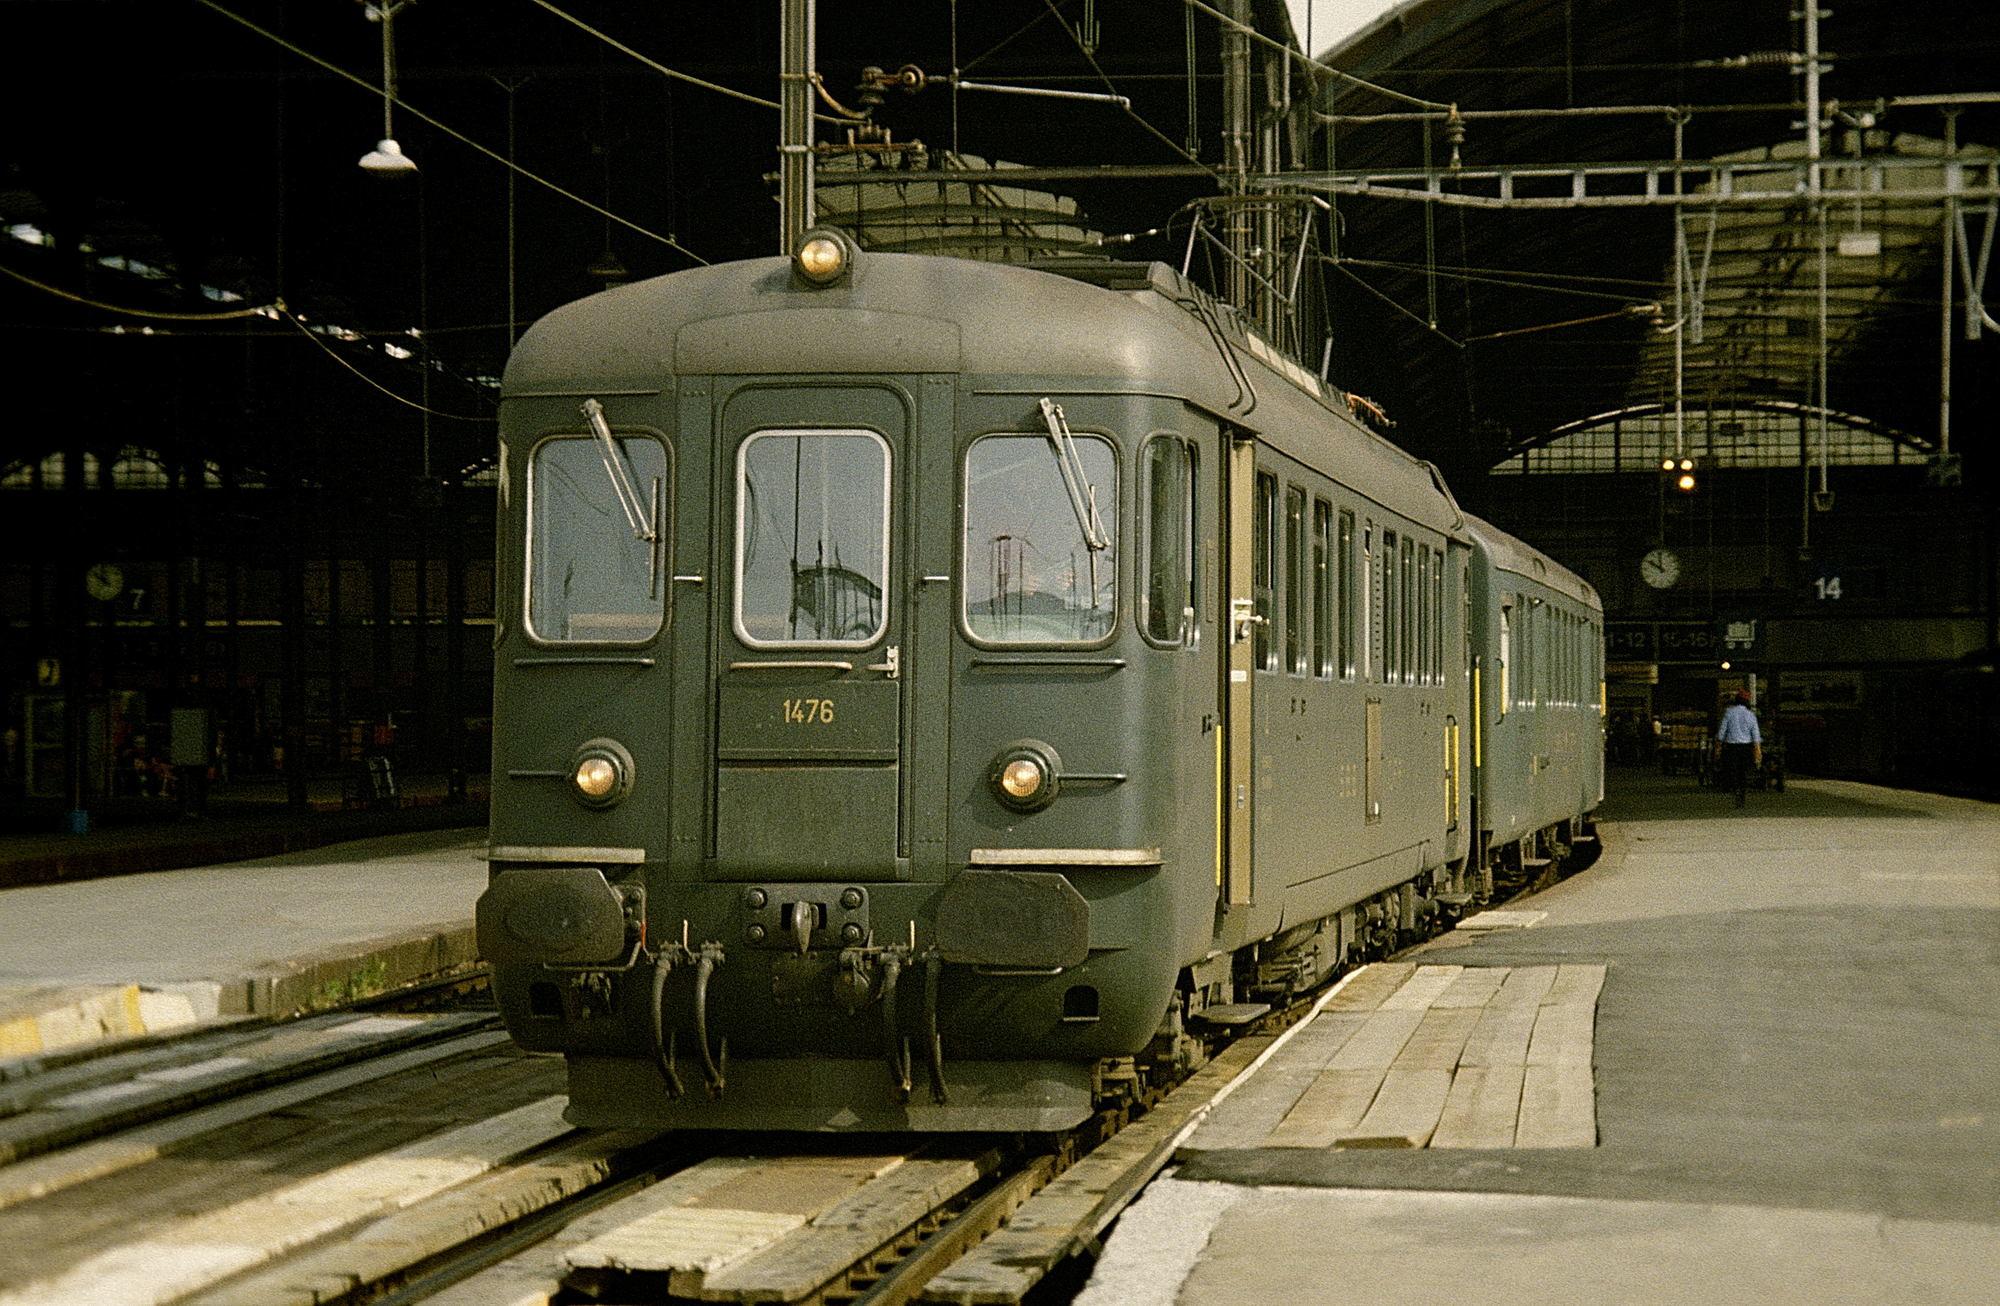 RBe 4/4 1476 in Luzern